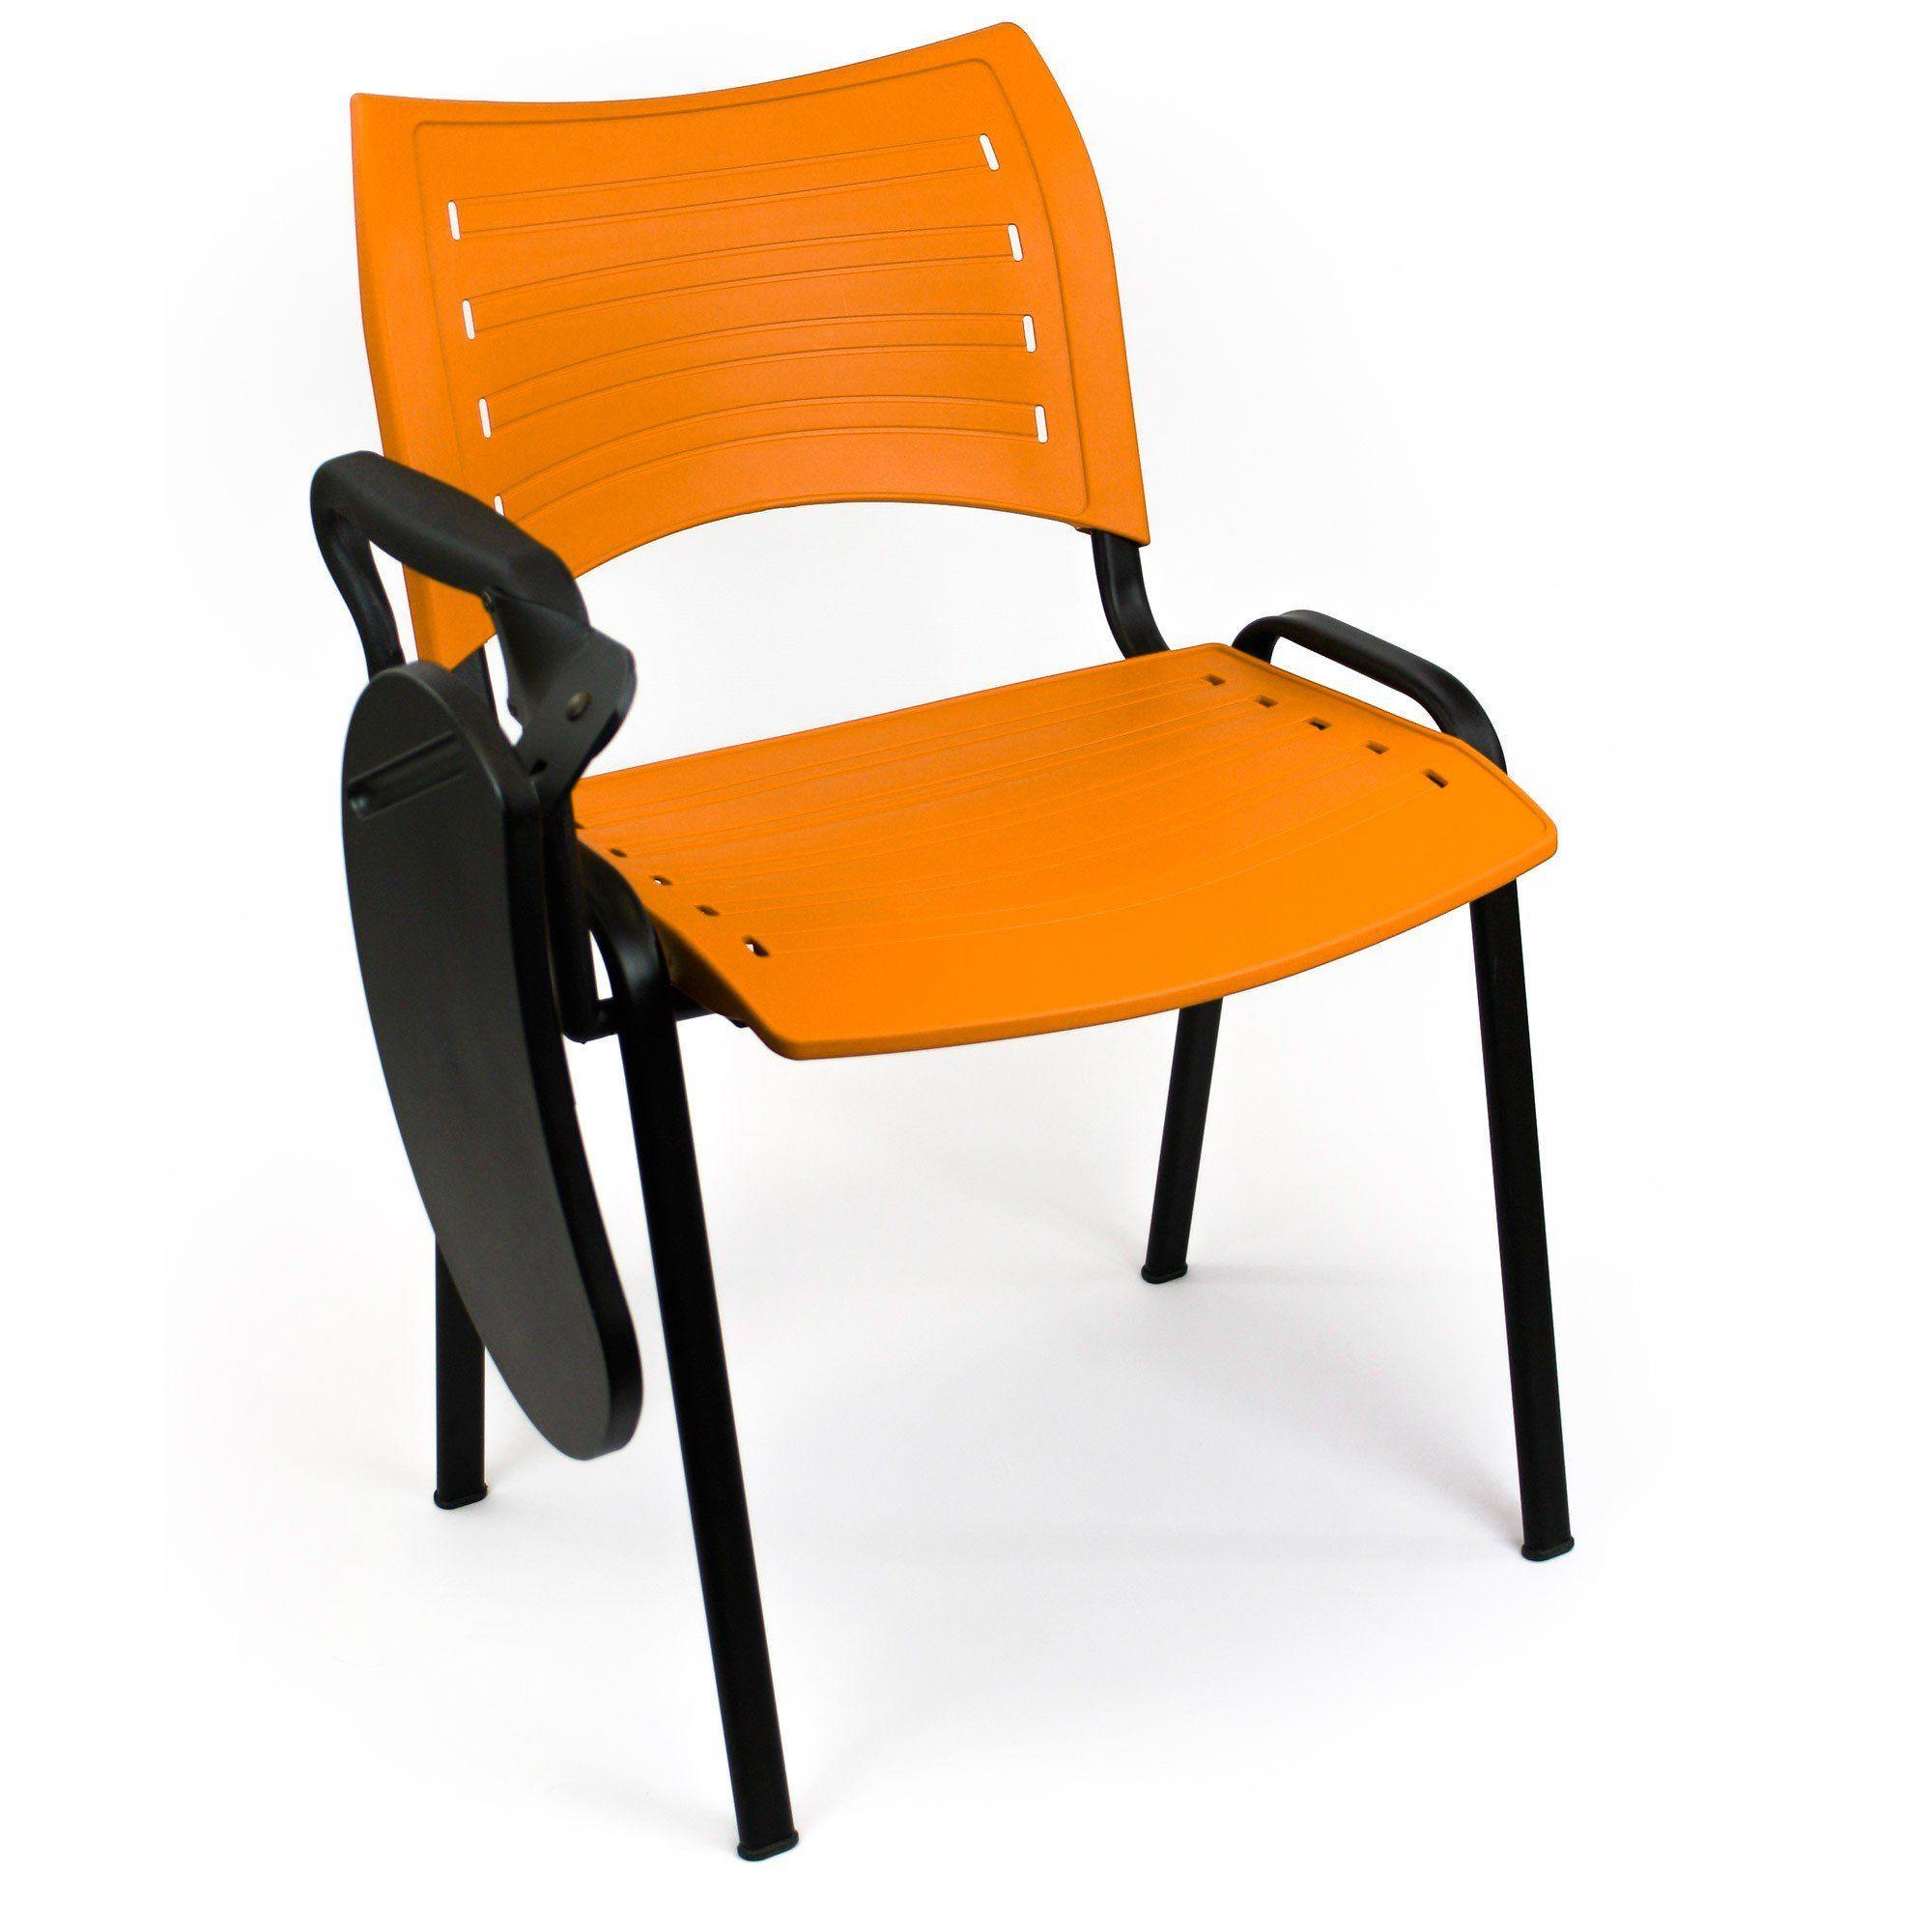 Silla New College naranja con pala poliamida